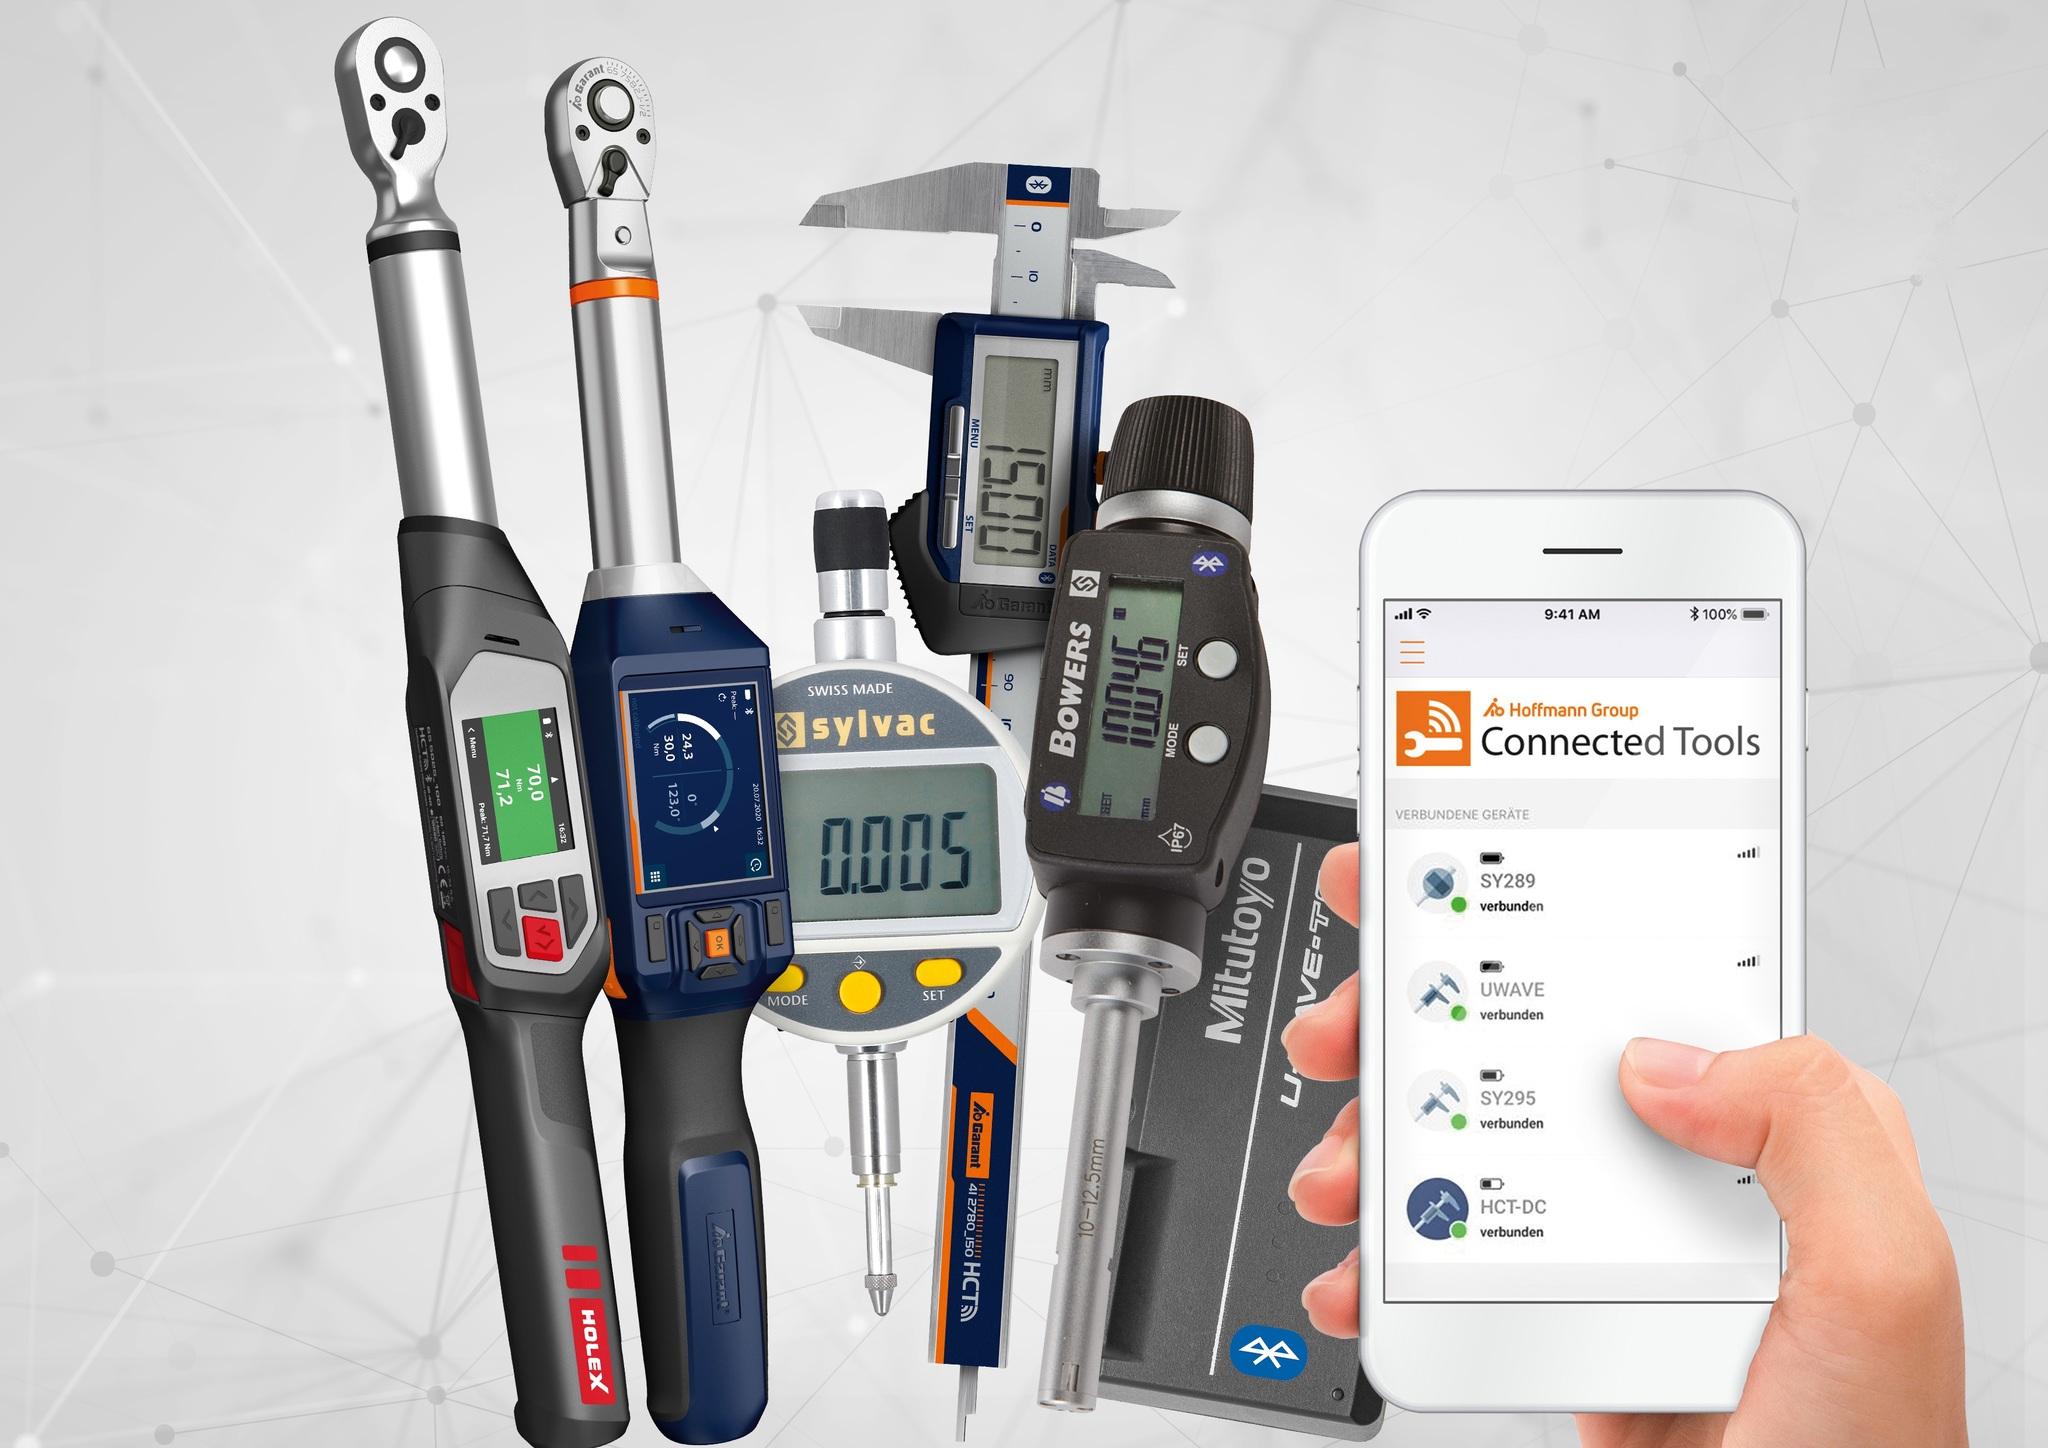 Расширение линейки Hoffmann Group Connected Tools (HCT)